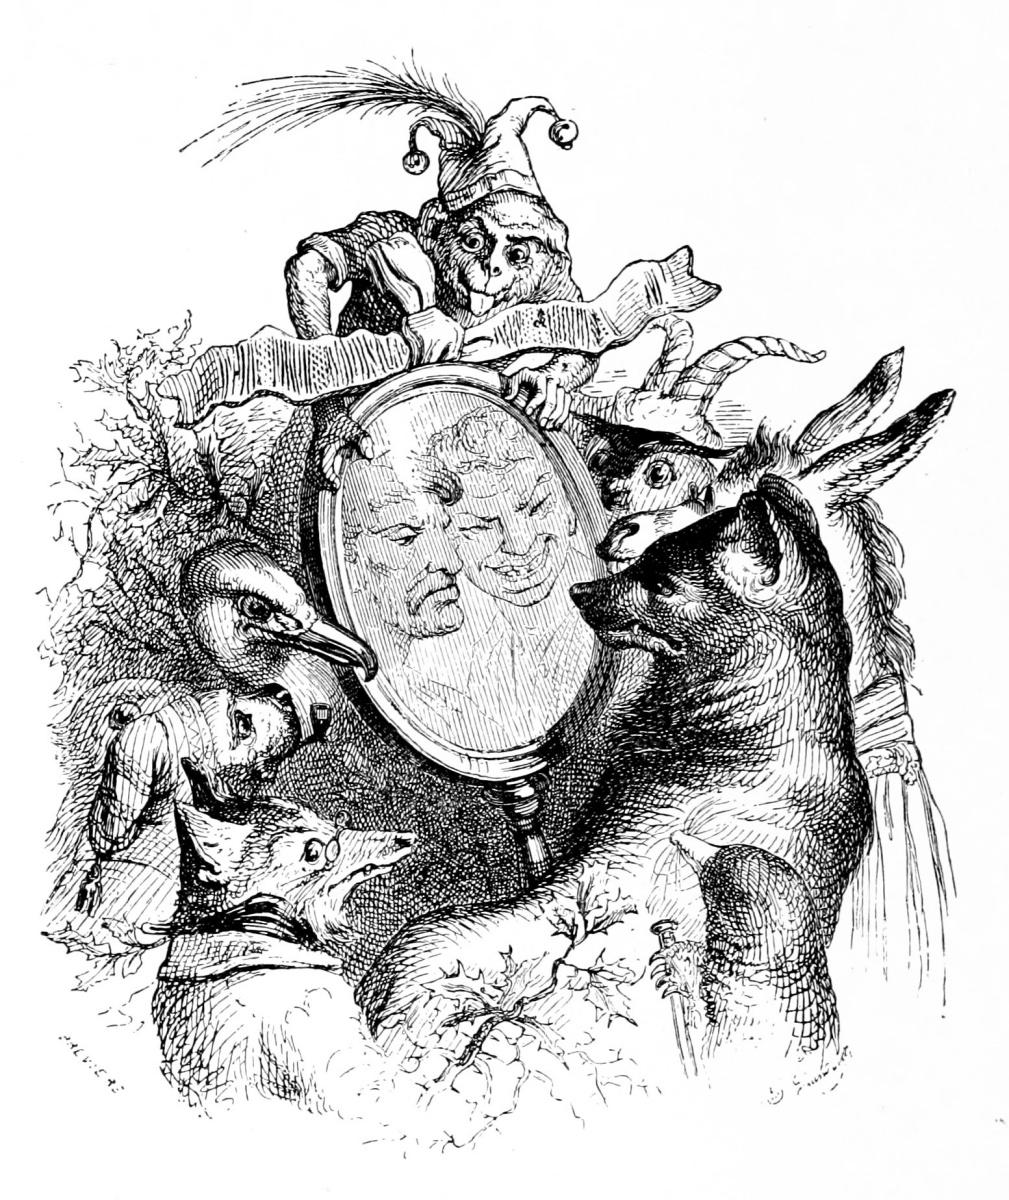 Жан Иньяс Изидор (Жерар) Гранвиль. Зеркало Правды. Иллюстрации к басням Флориана